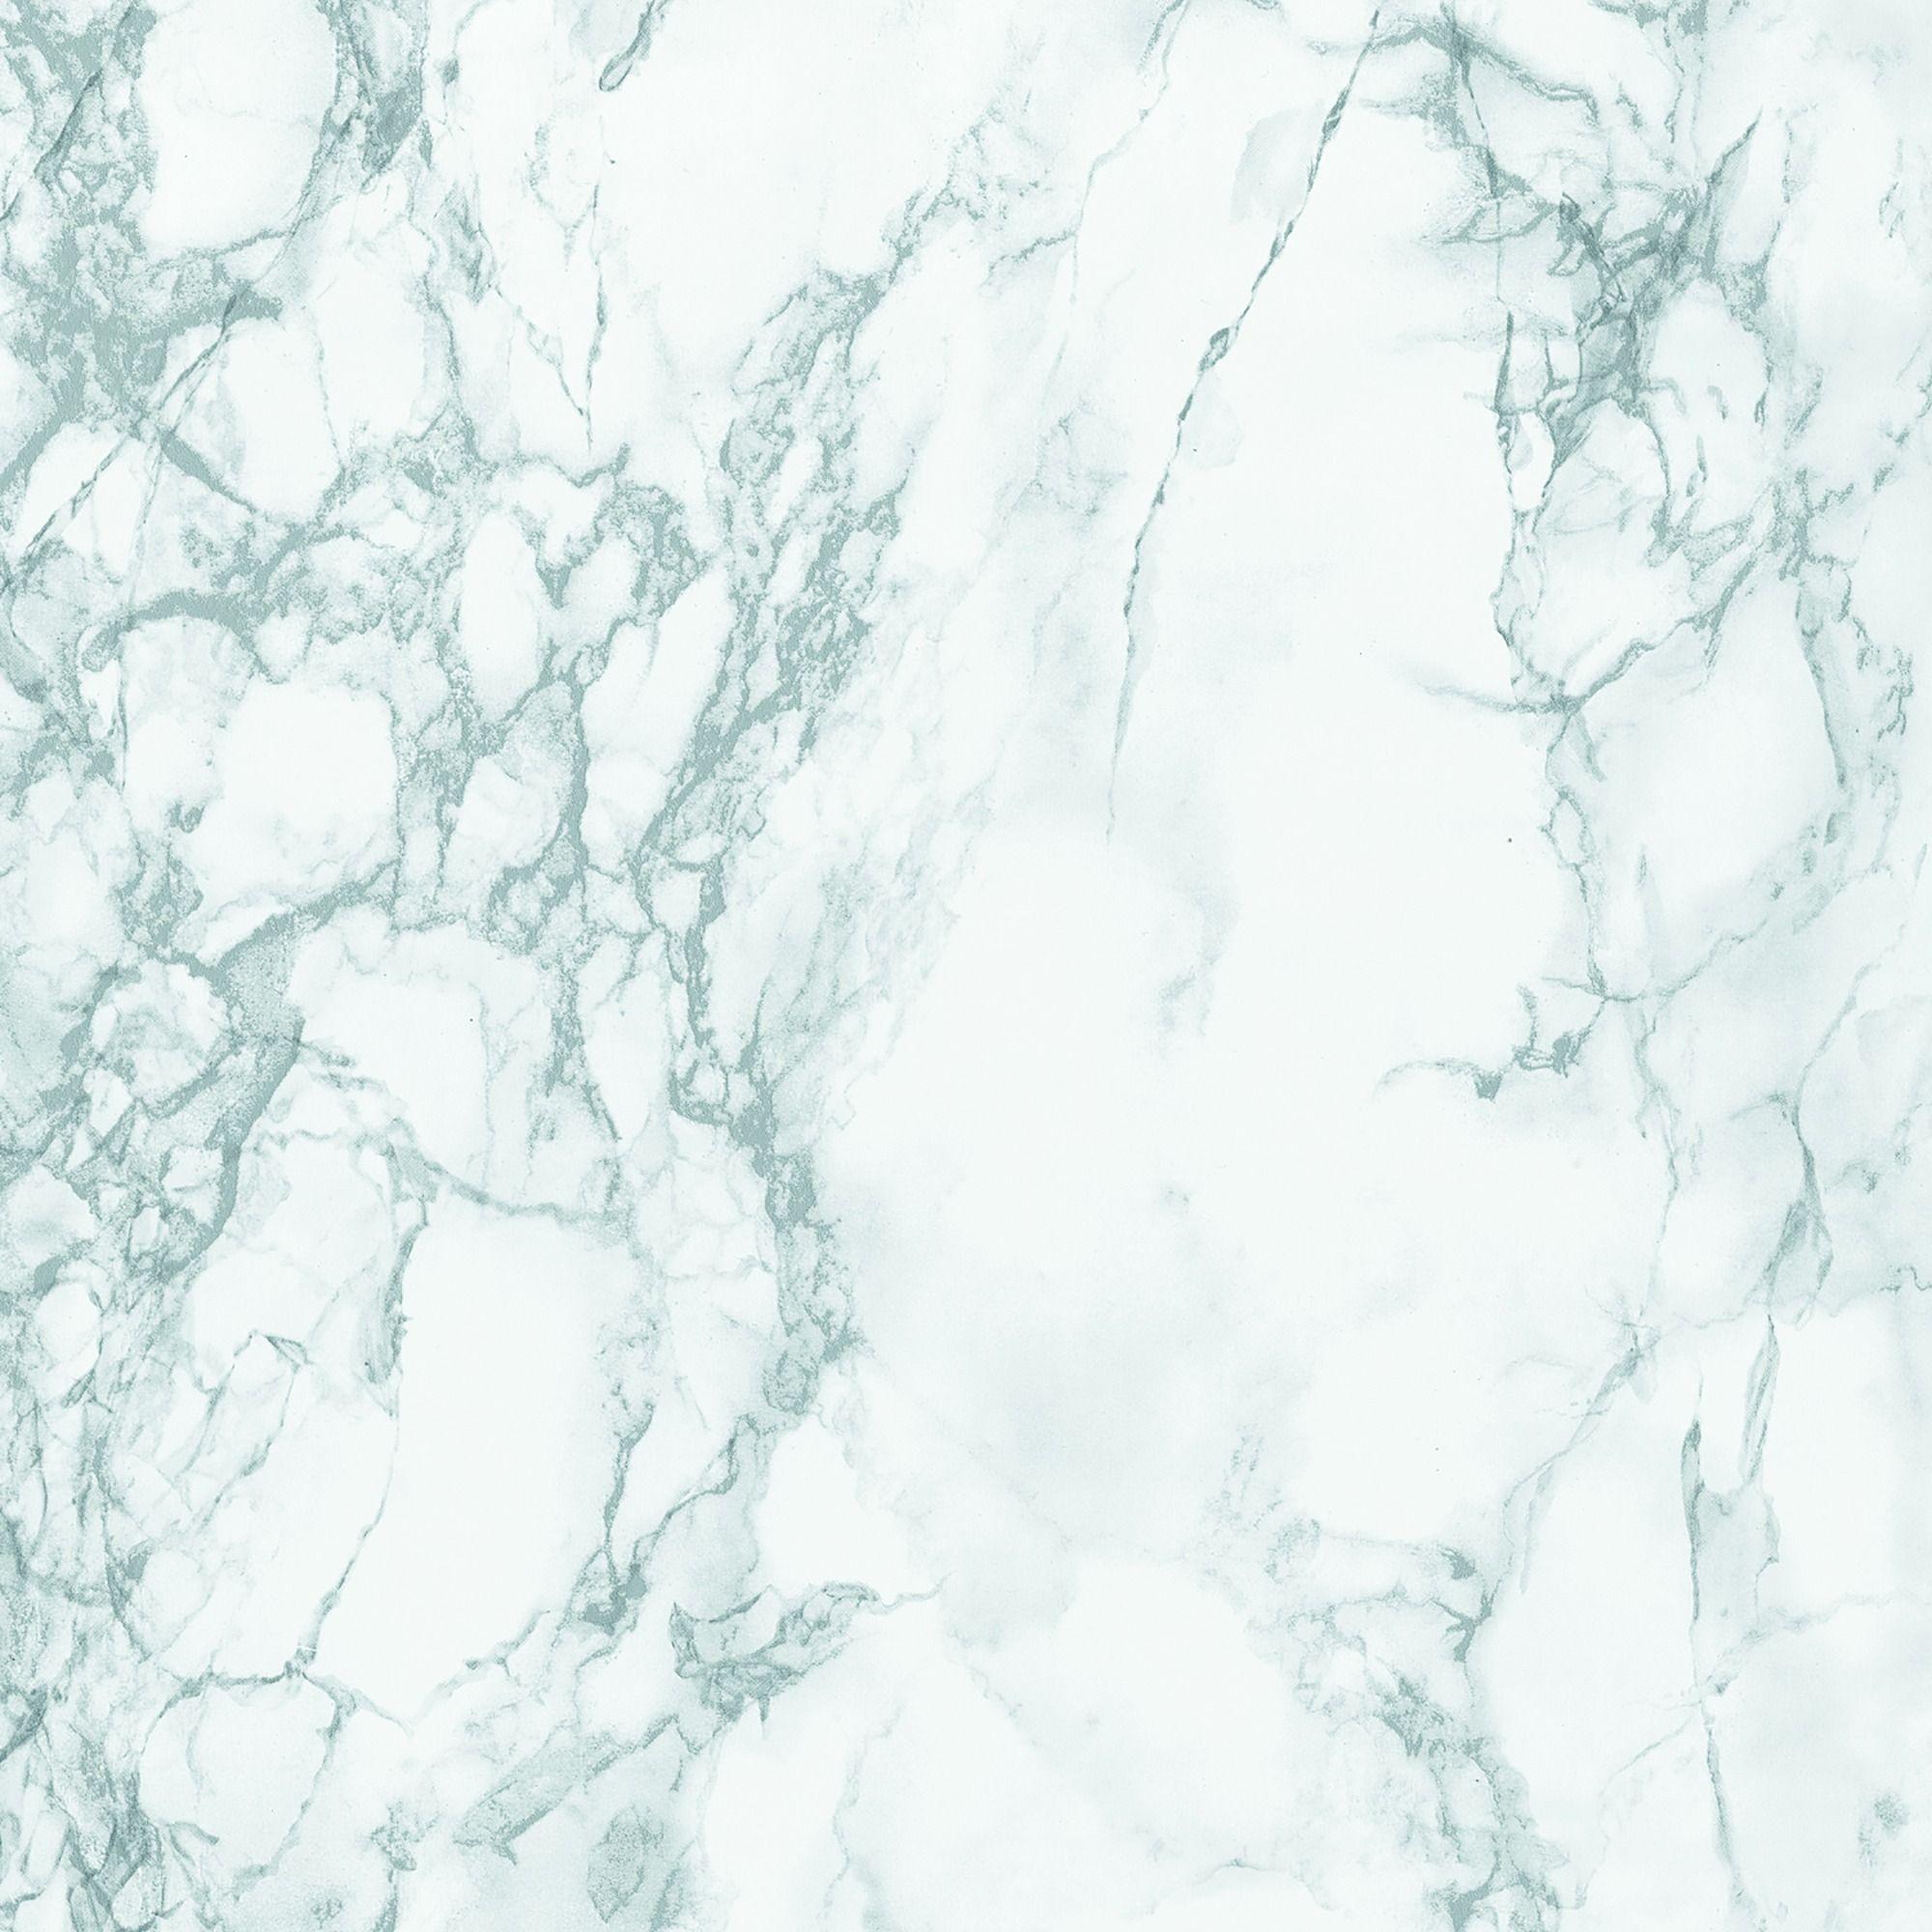 Karwei Decoratiefolie Marmer 200 X 45 Cm 346 0306 Zelfklevend Wit Marmer Grijs